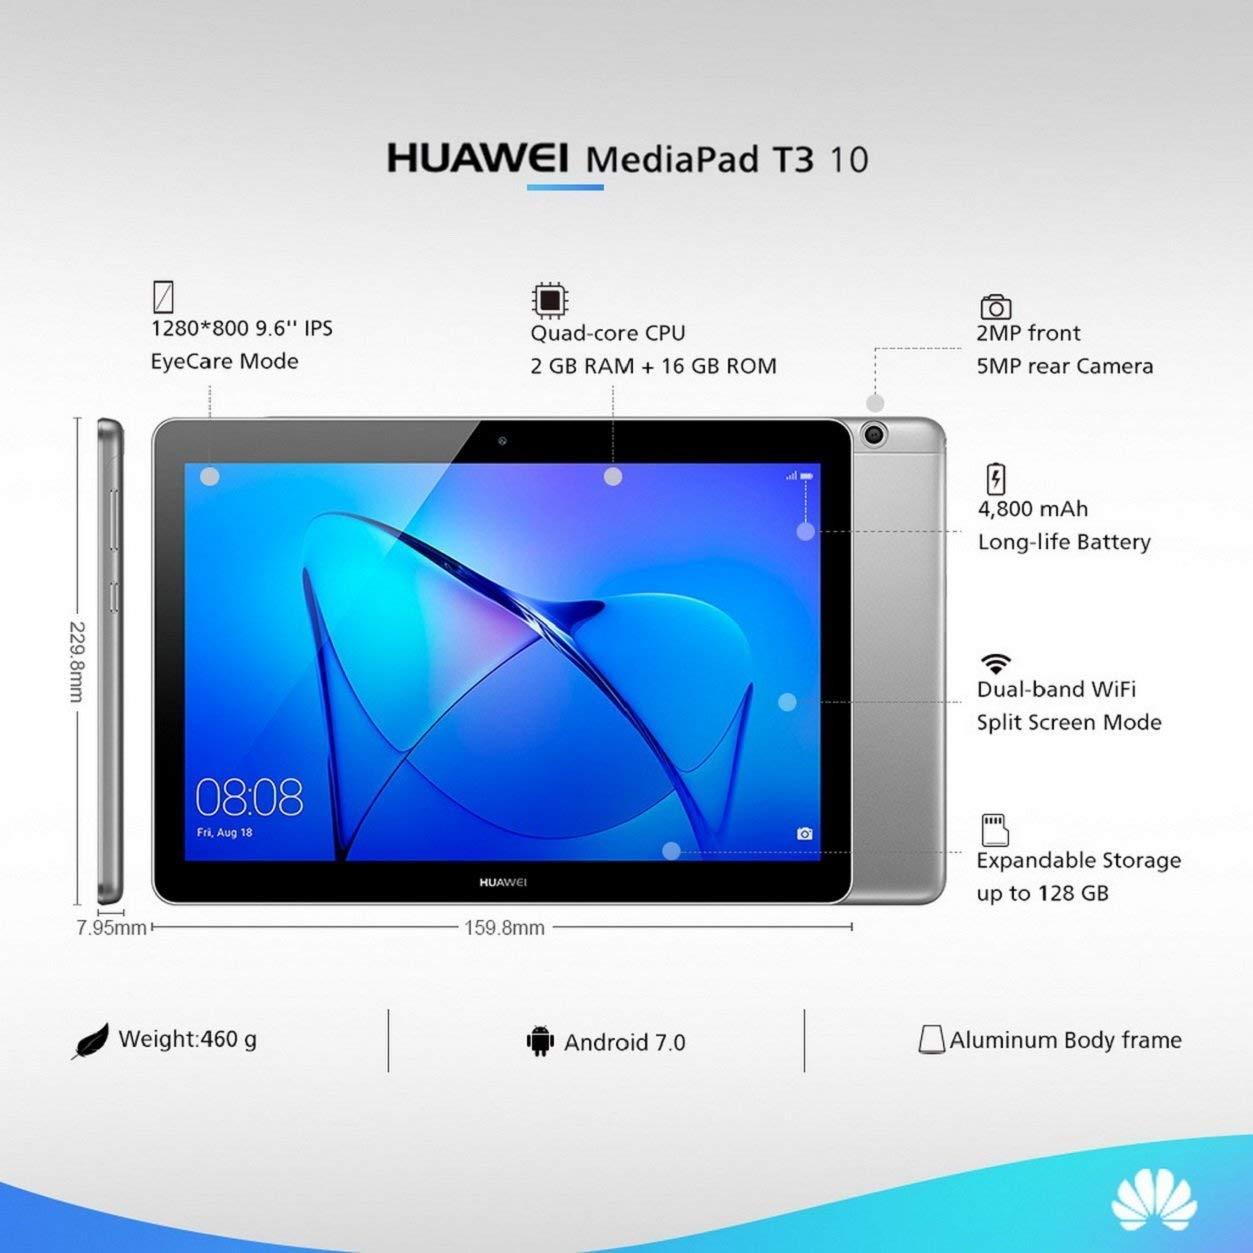 HUAWEI MediaPad T3 10 – 9 6